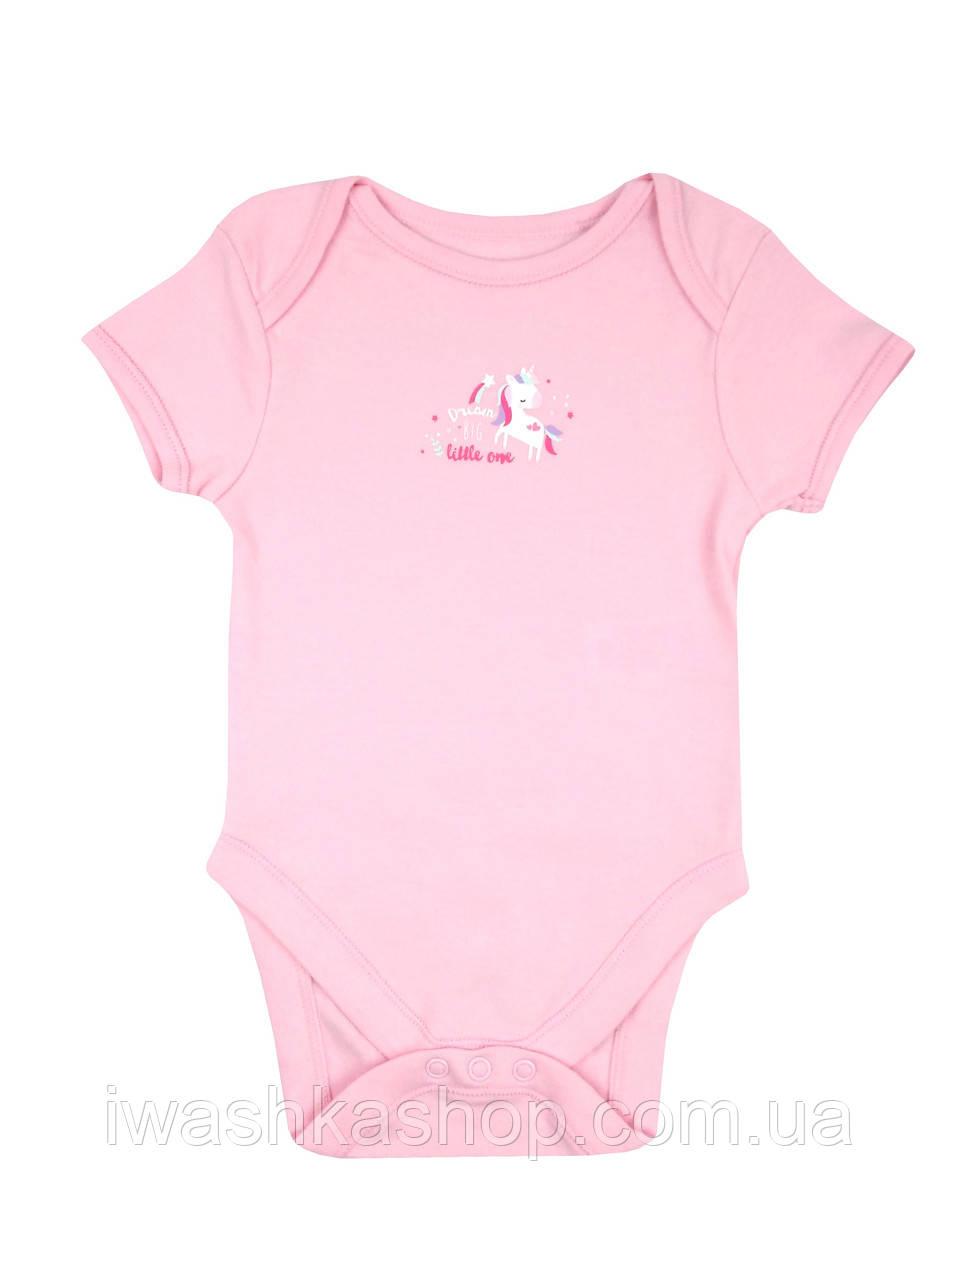 Розовое боди с короткими рукавами, с единорогом на девочек 3 - 6 месяцев, р. 68, Early days by Primark